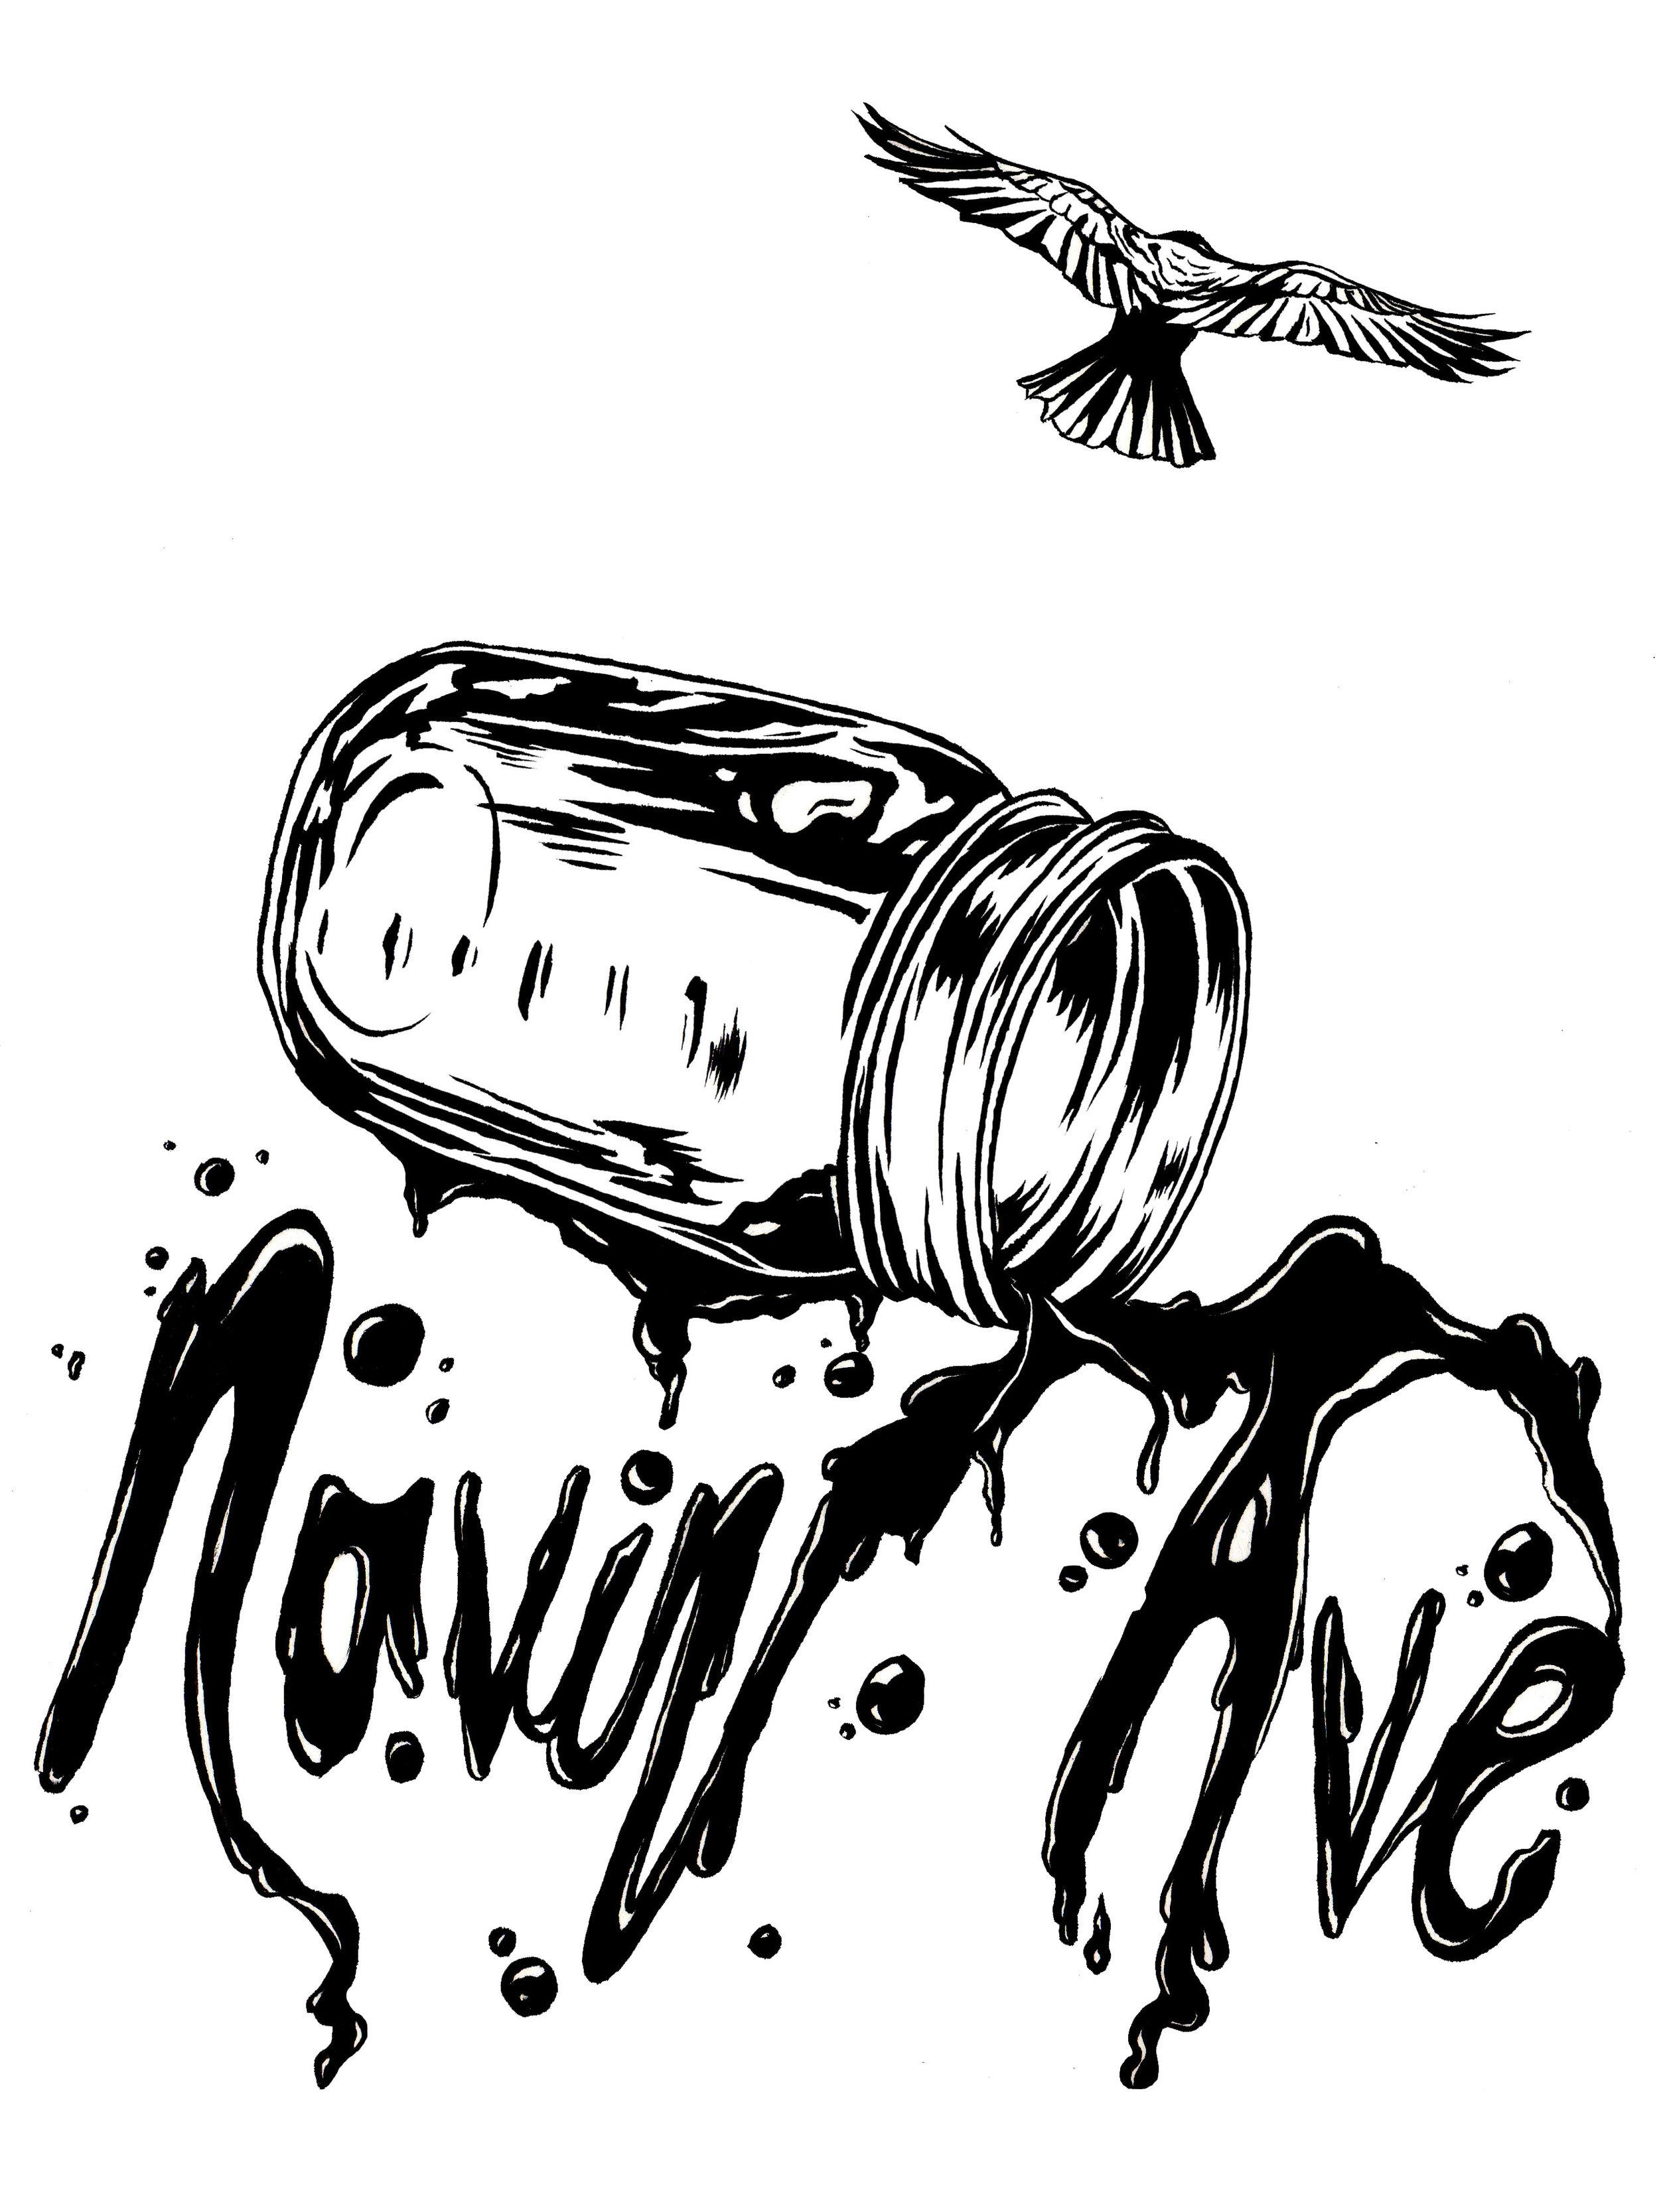 Navin Ave, logo